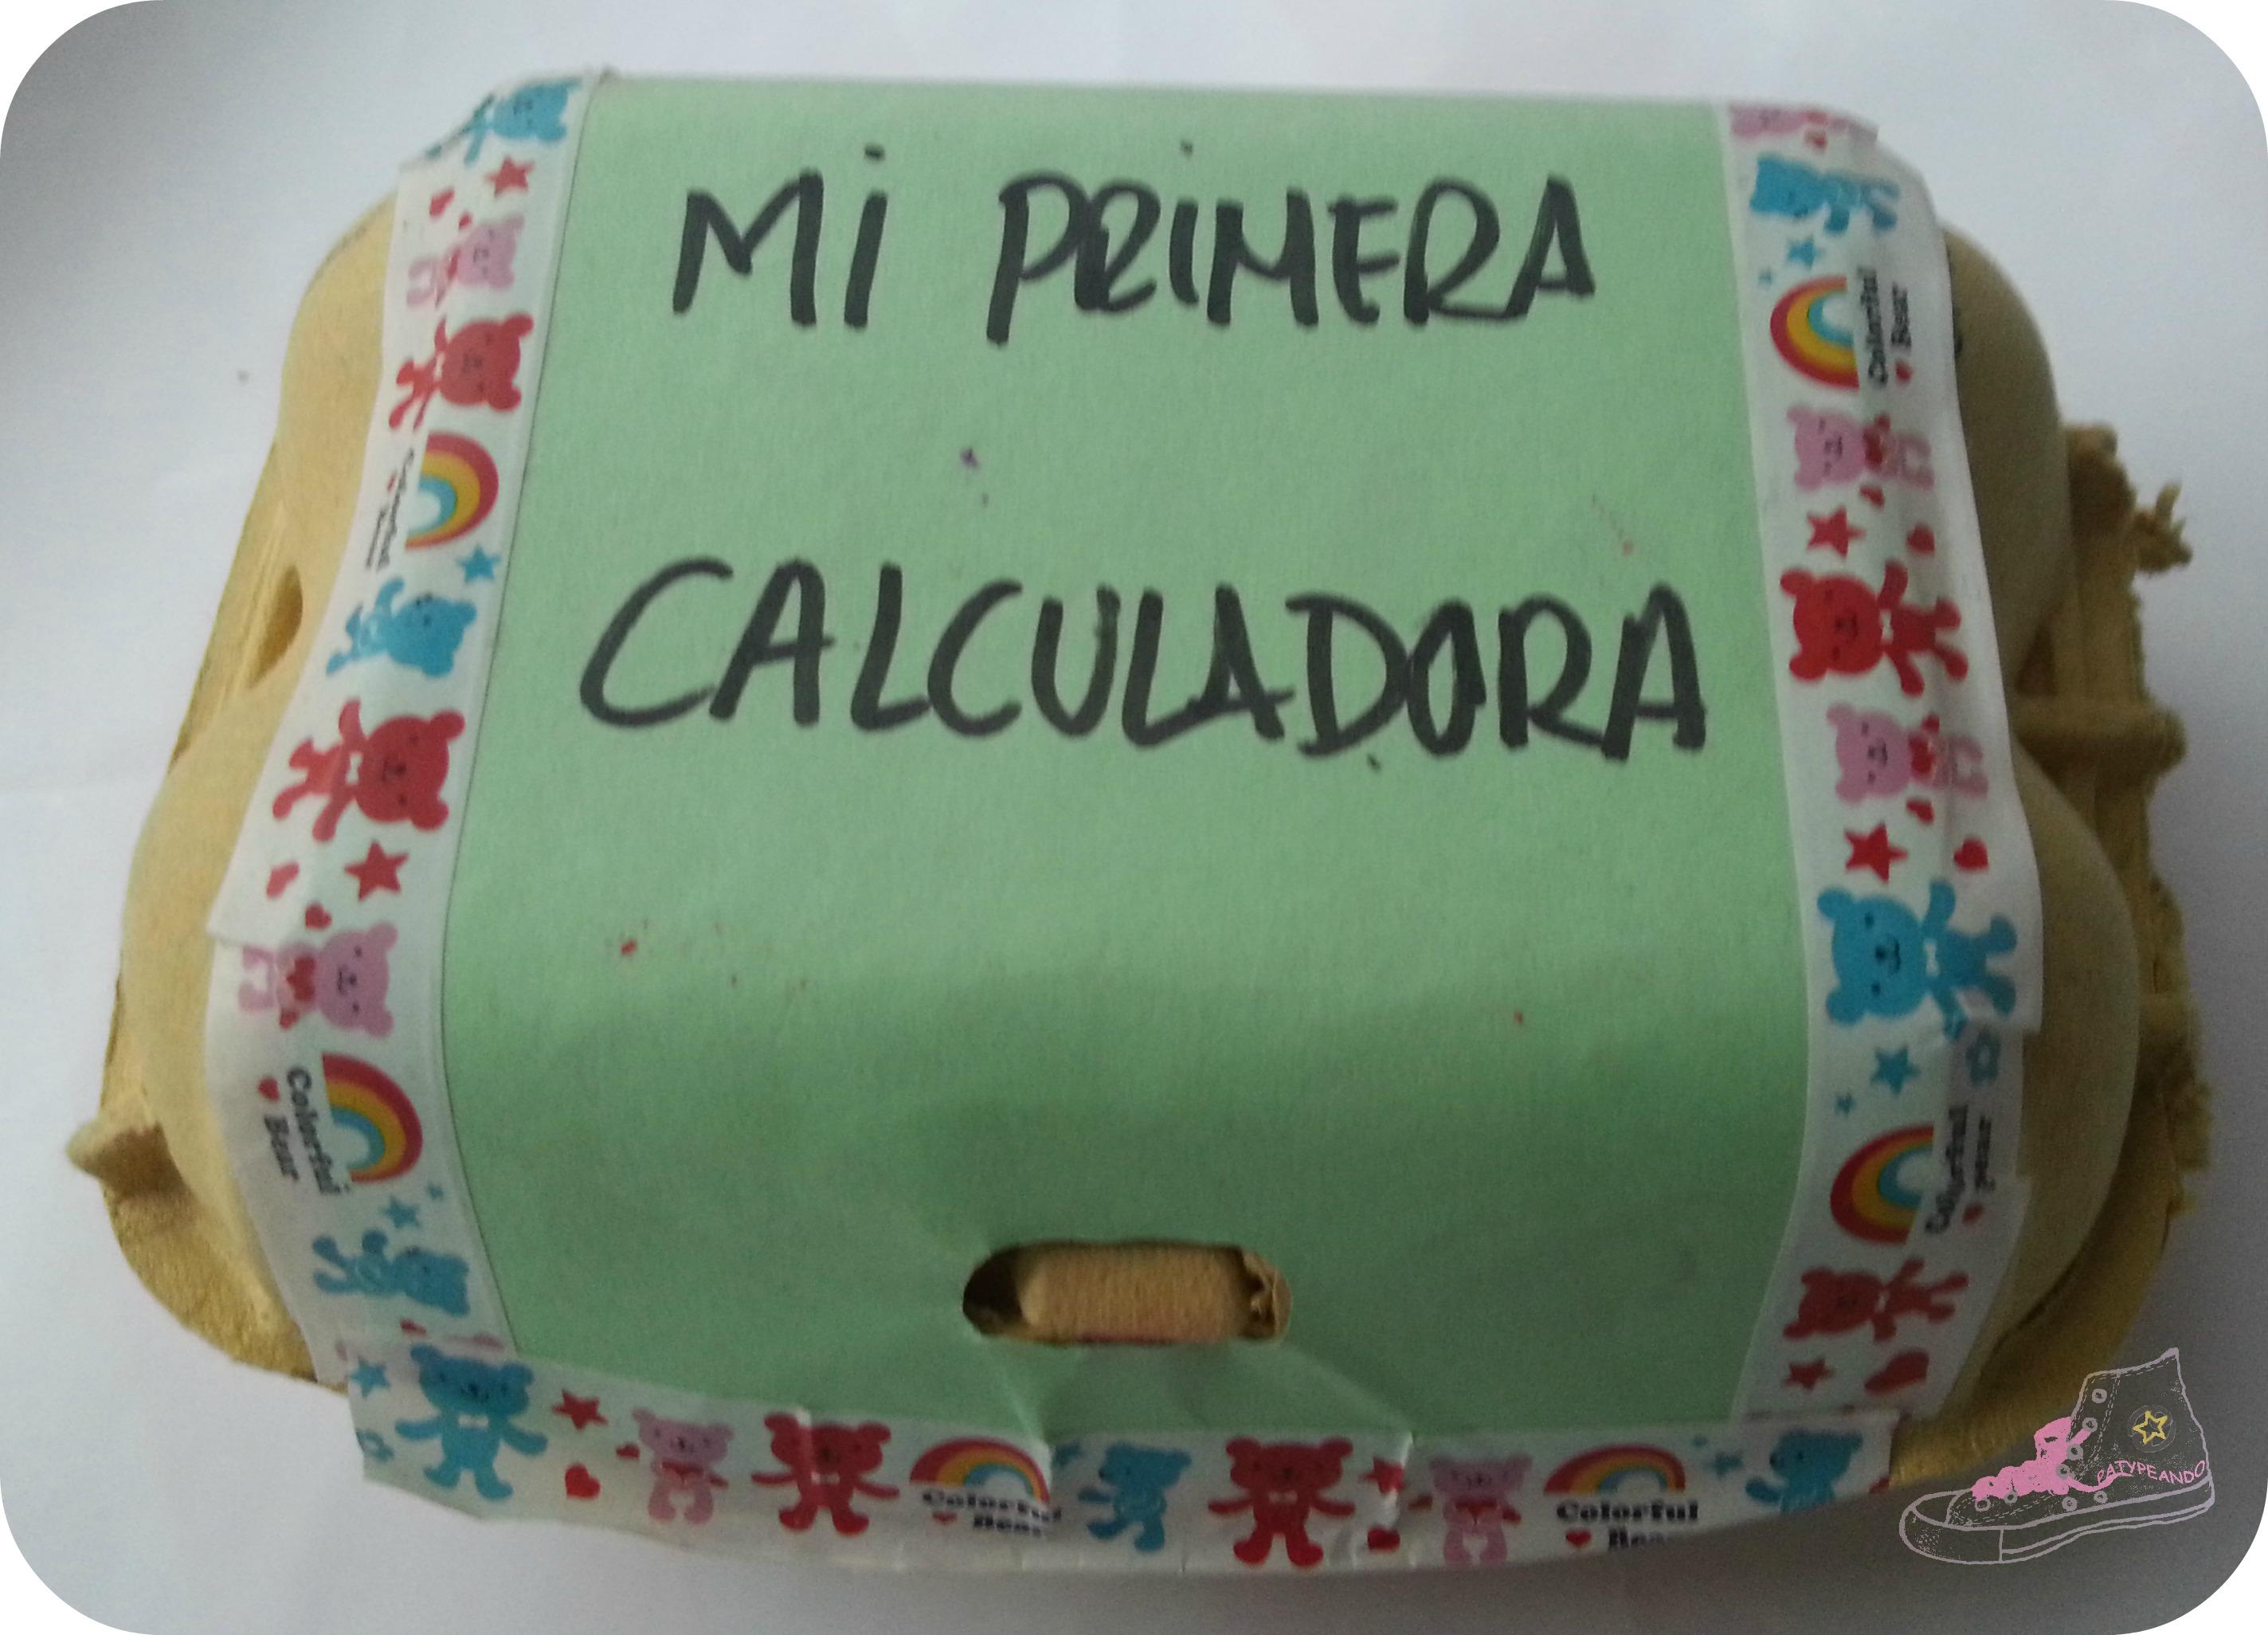 de huevera a calculadora